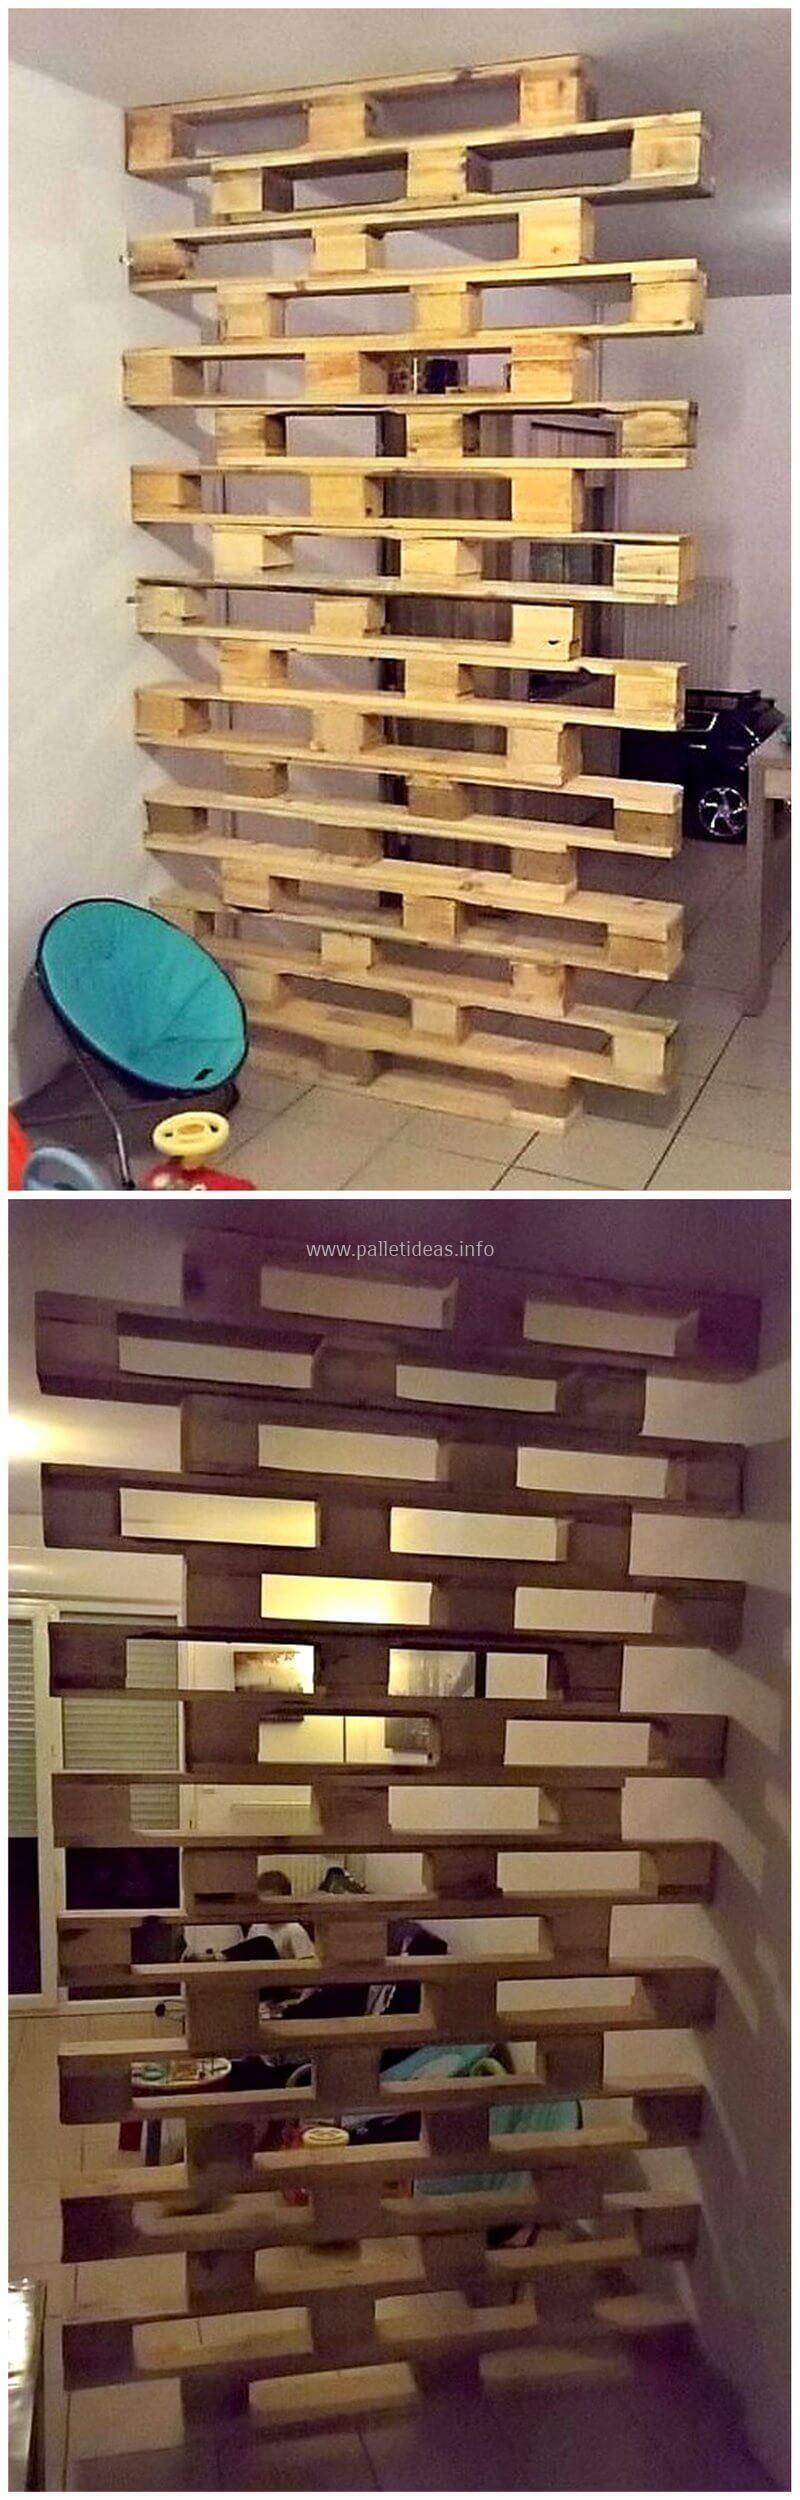 Room divider idea diy woodworking pinterest divider room and